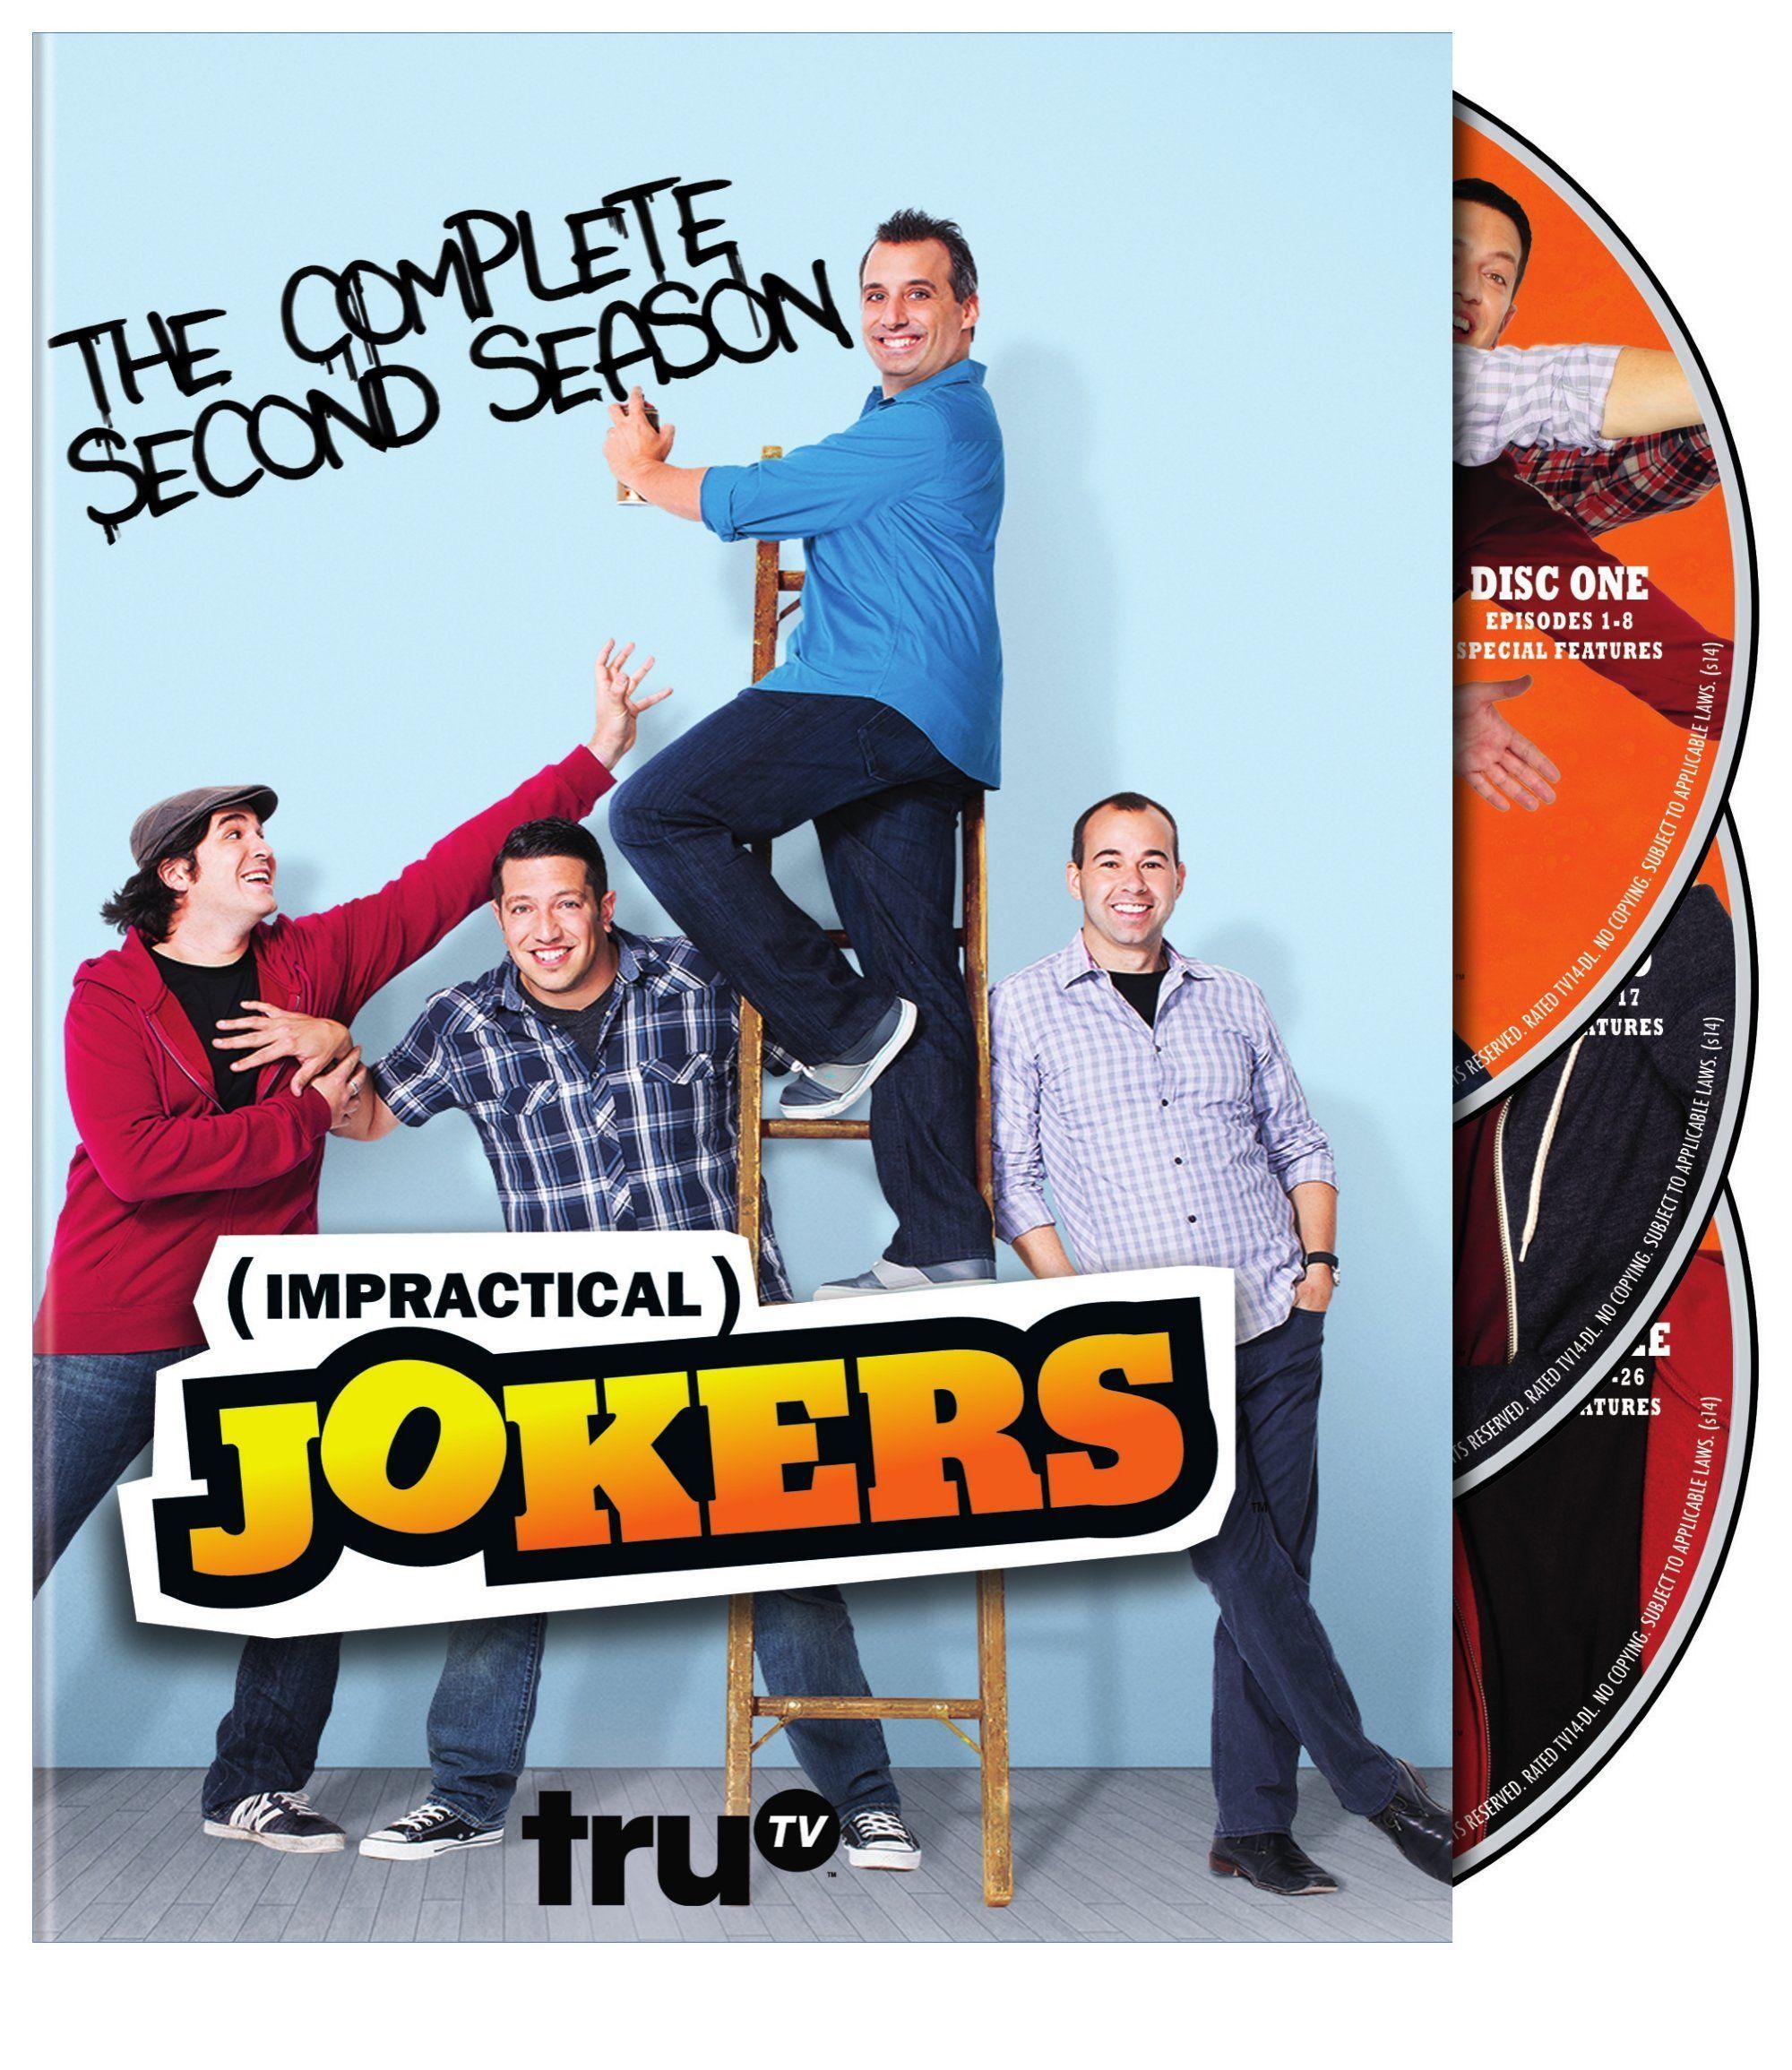 Impractical Jokers Season Two Impractical jokers, Joker